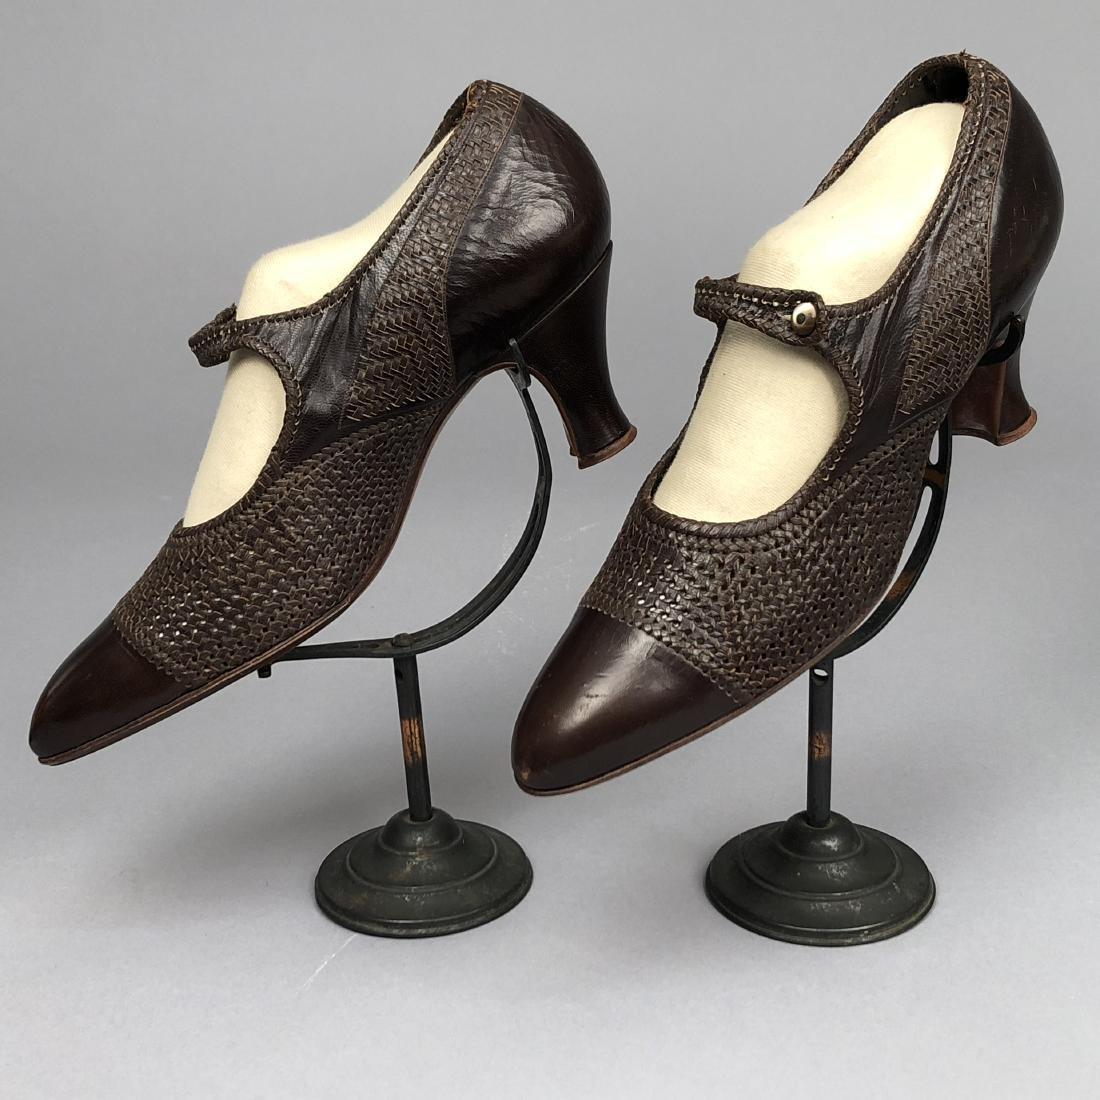 THREE PAIR LADIES' SHOES, 1910 - 1930 - 2